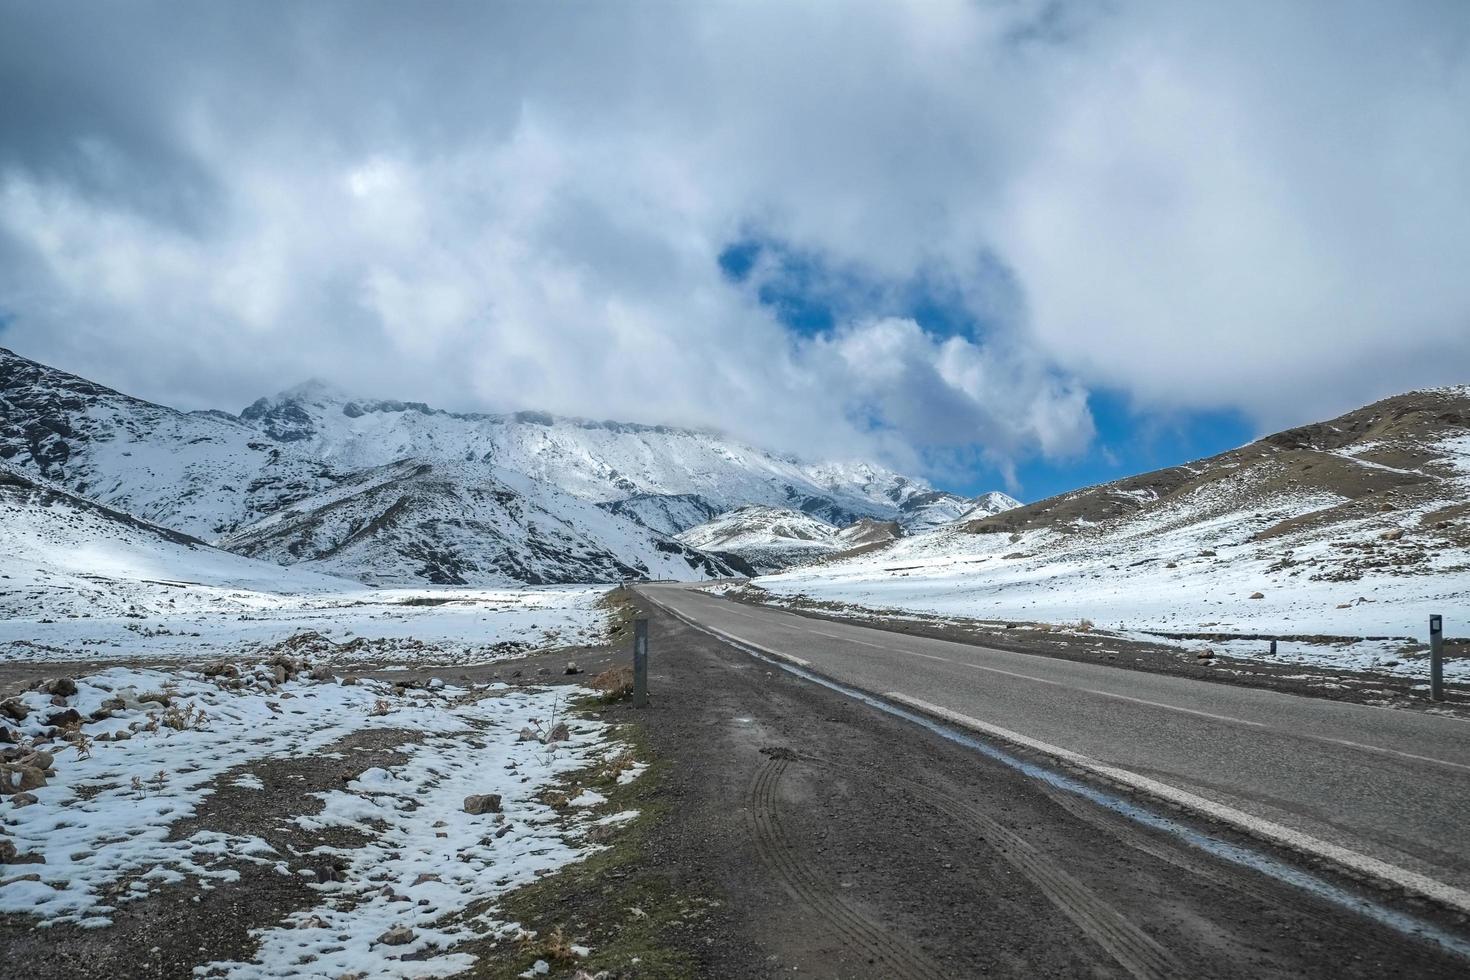 A road amid snow capped mountain range photo